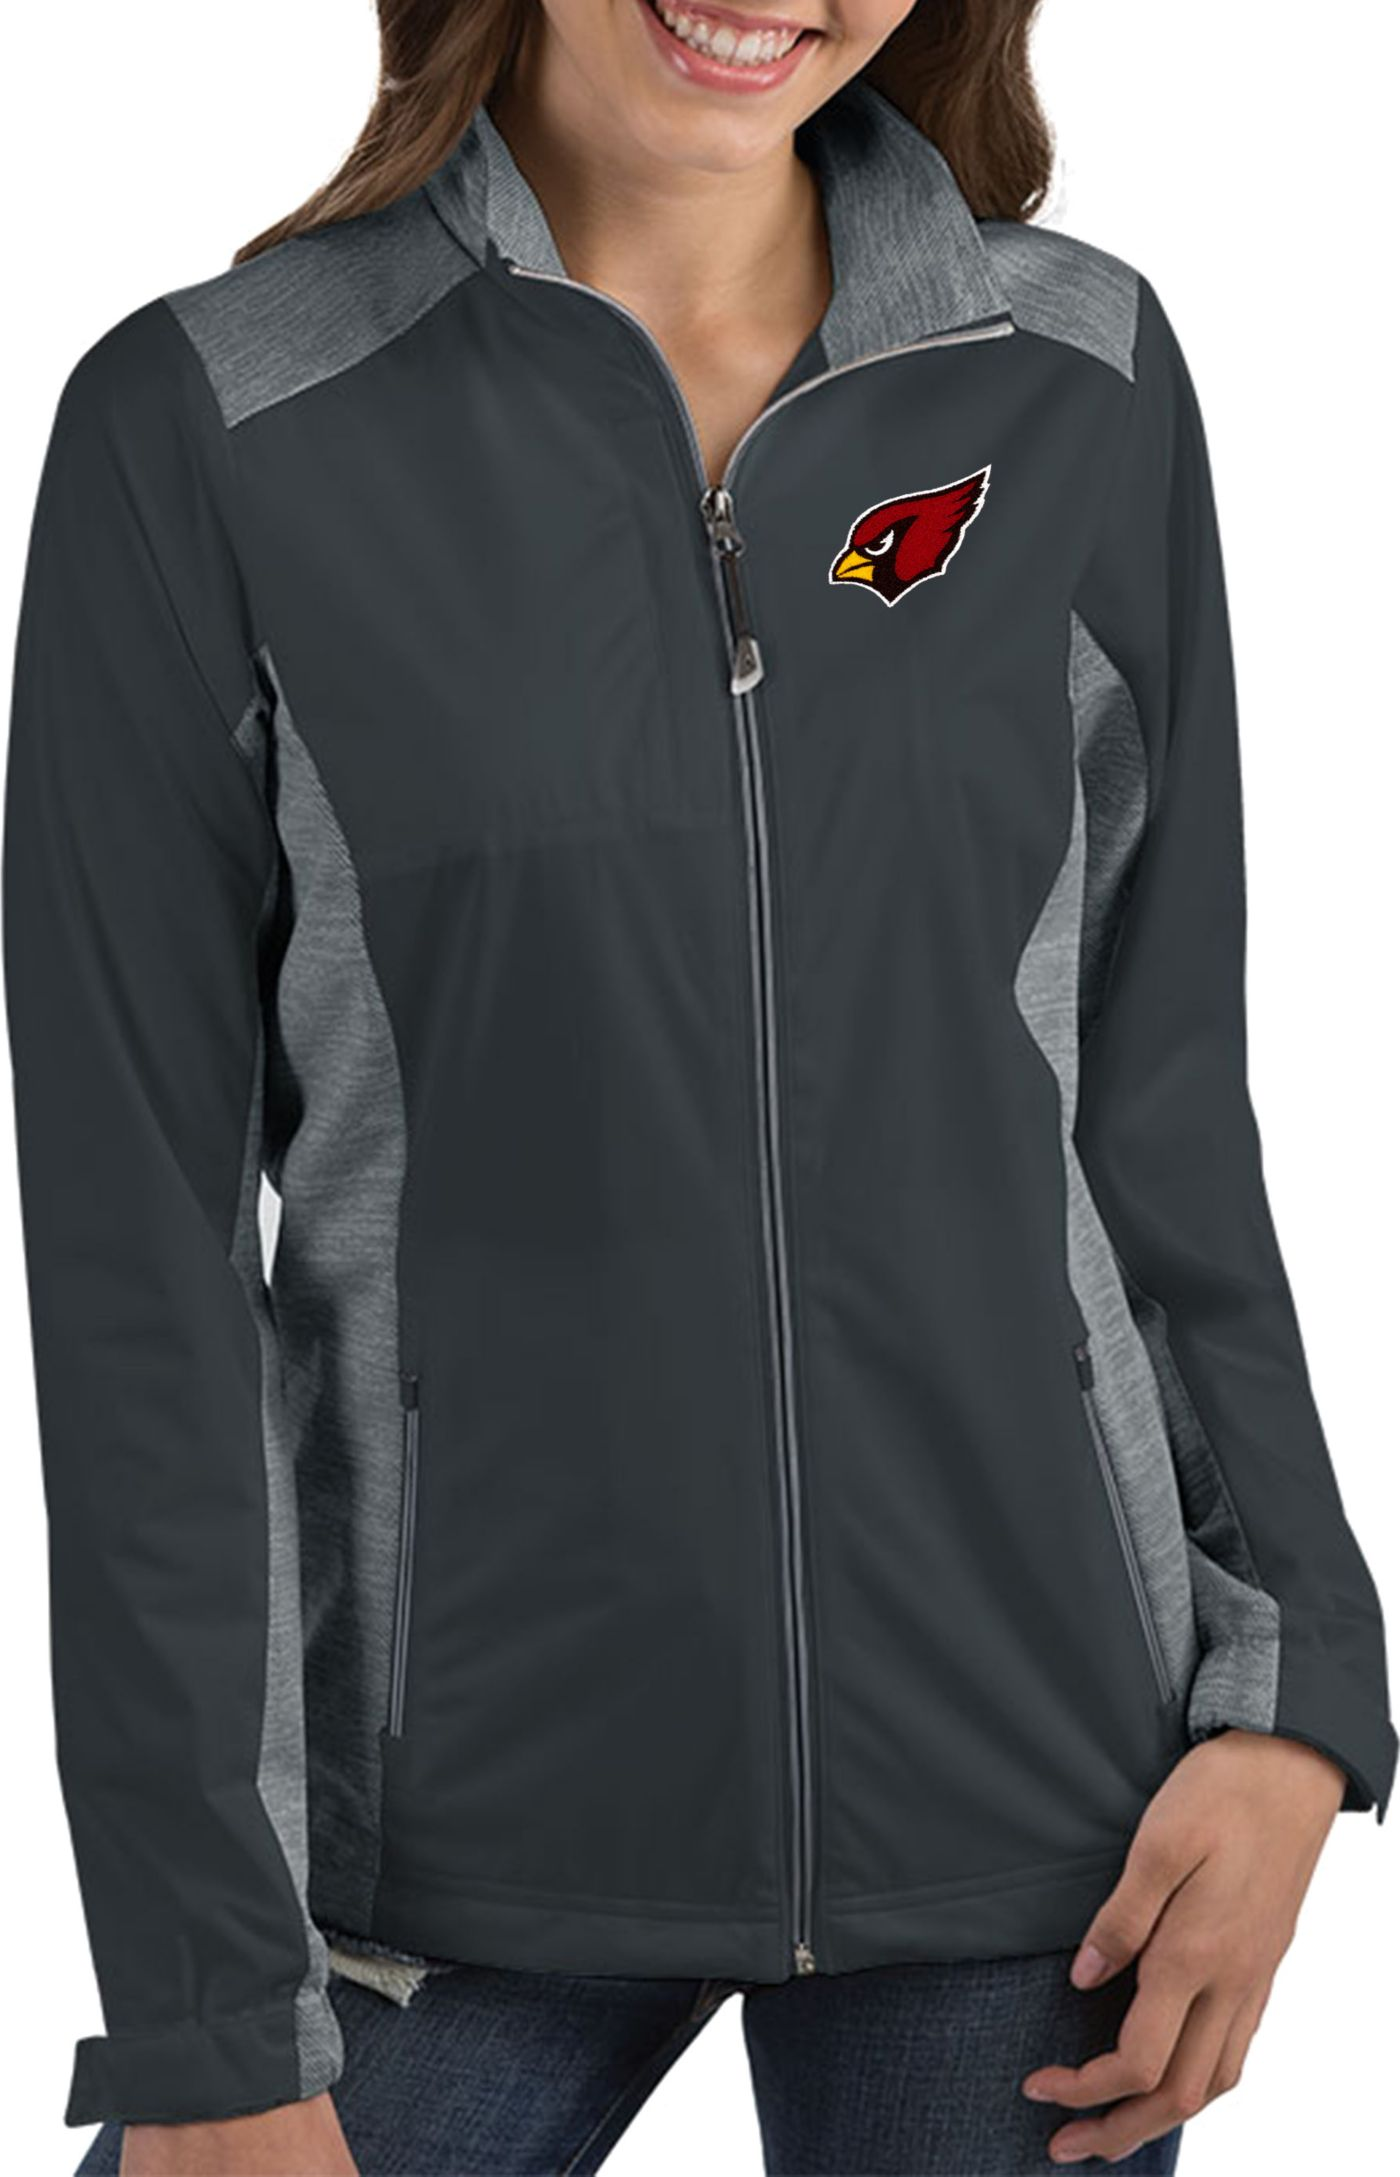 Antigua Women's Arizona Cardinals Revolve Charcoal Full-Zip Jacket